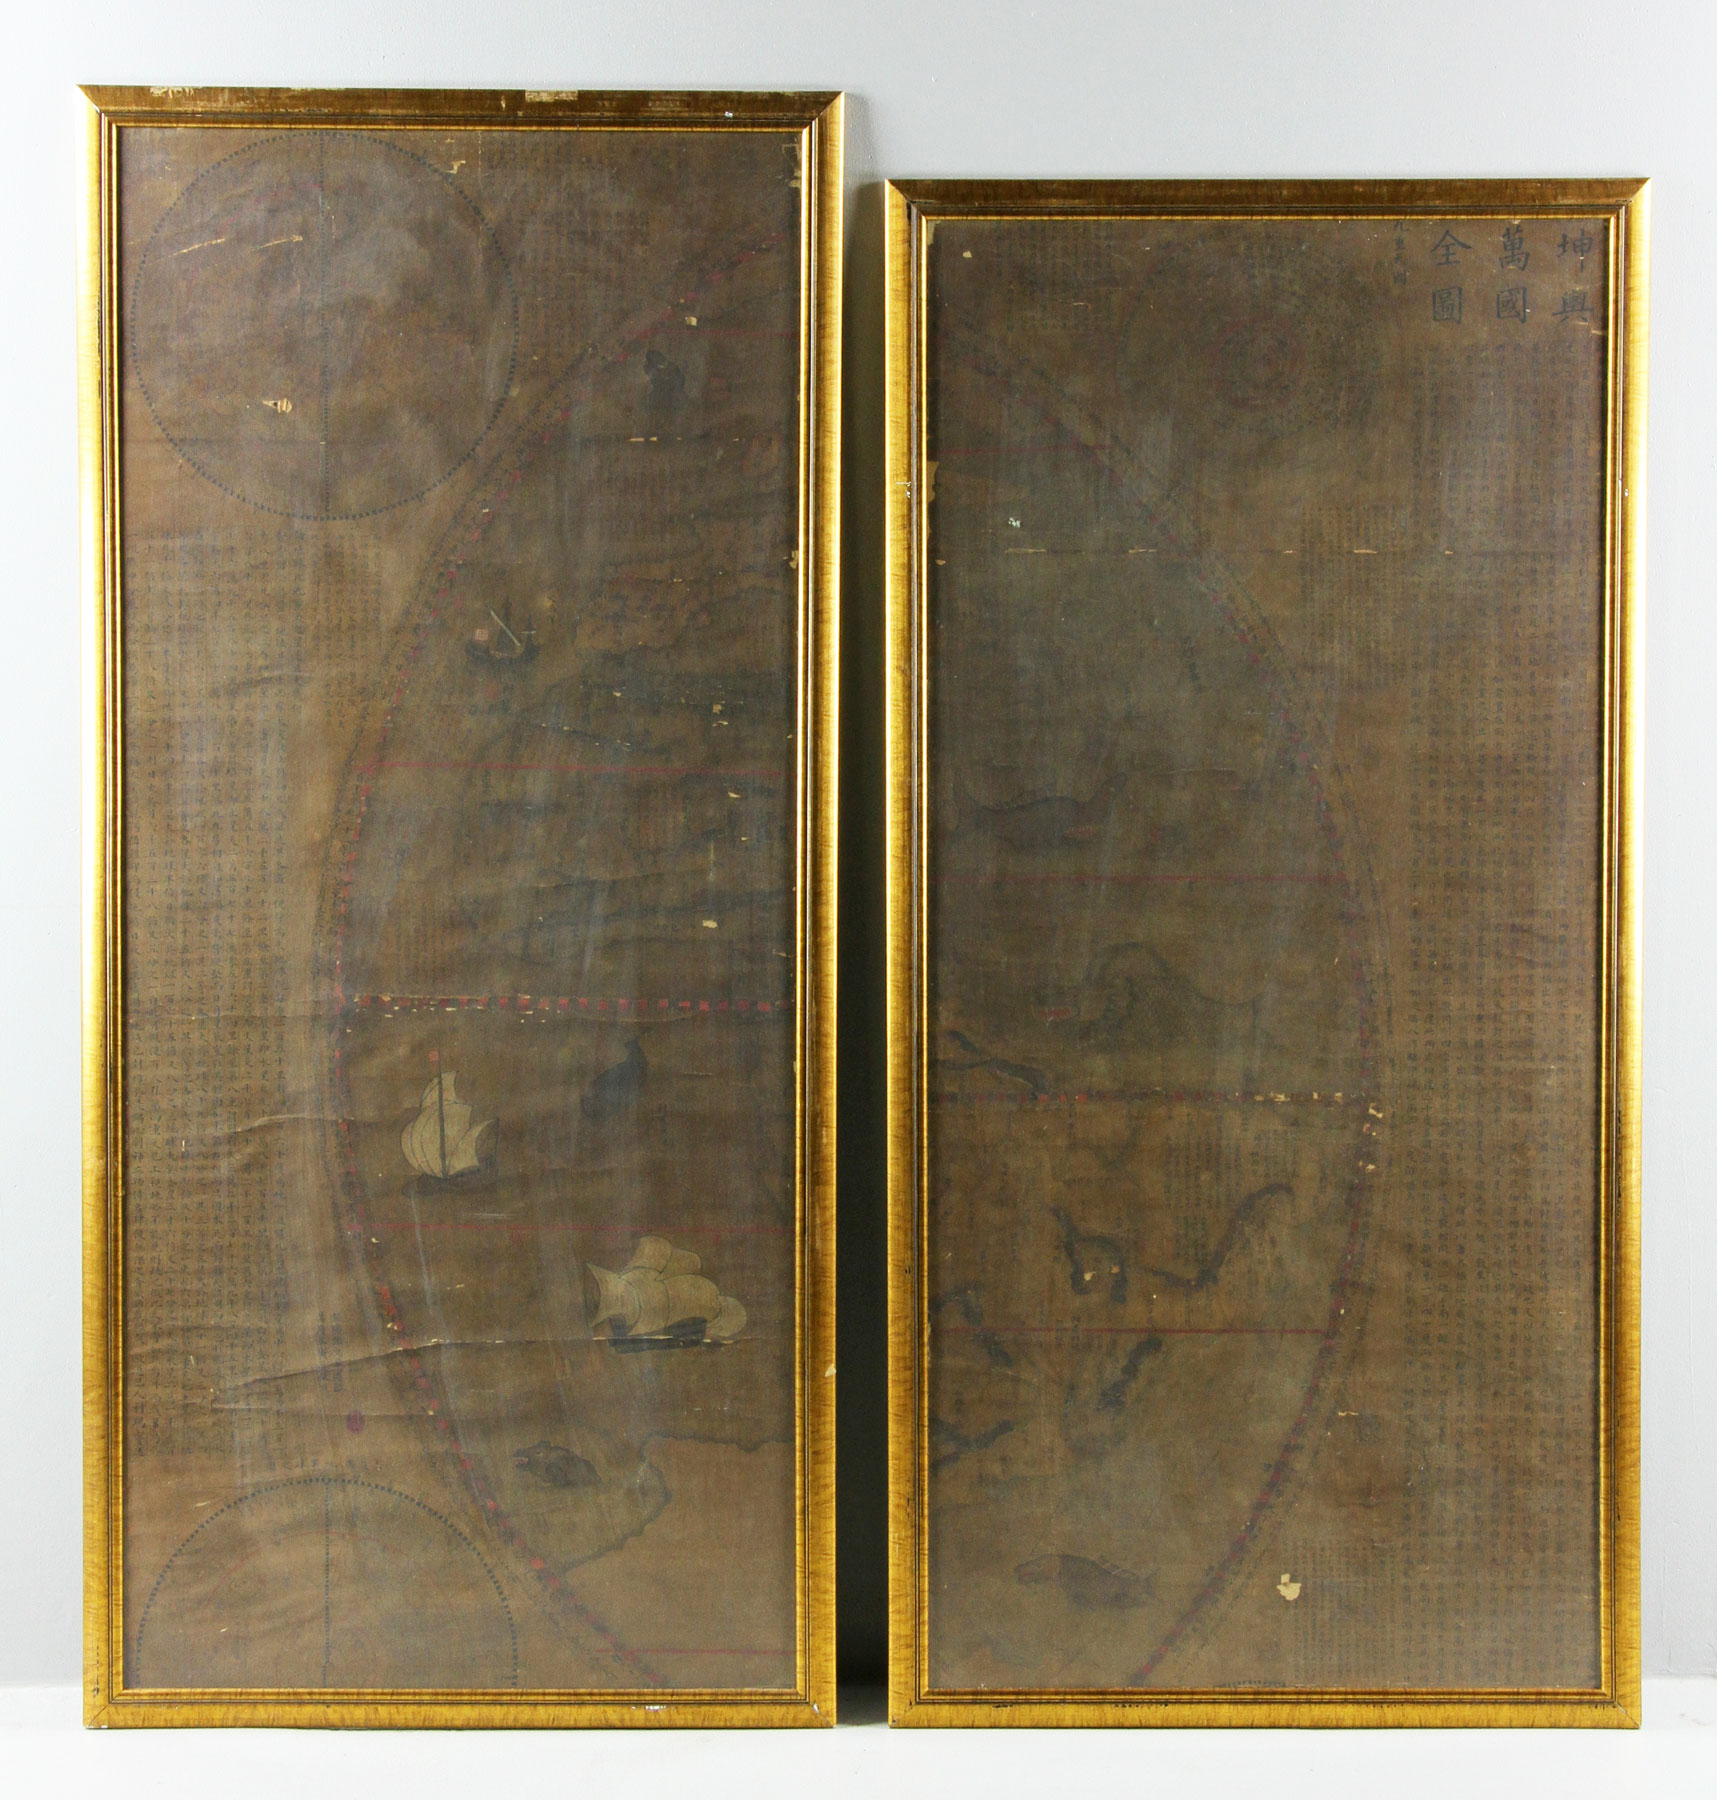 Rare Matteo Ricci Derivative Maps Found In Garage Sell For